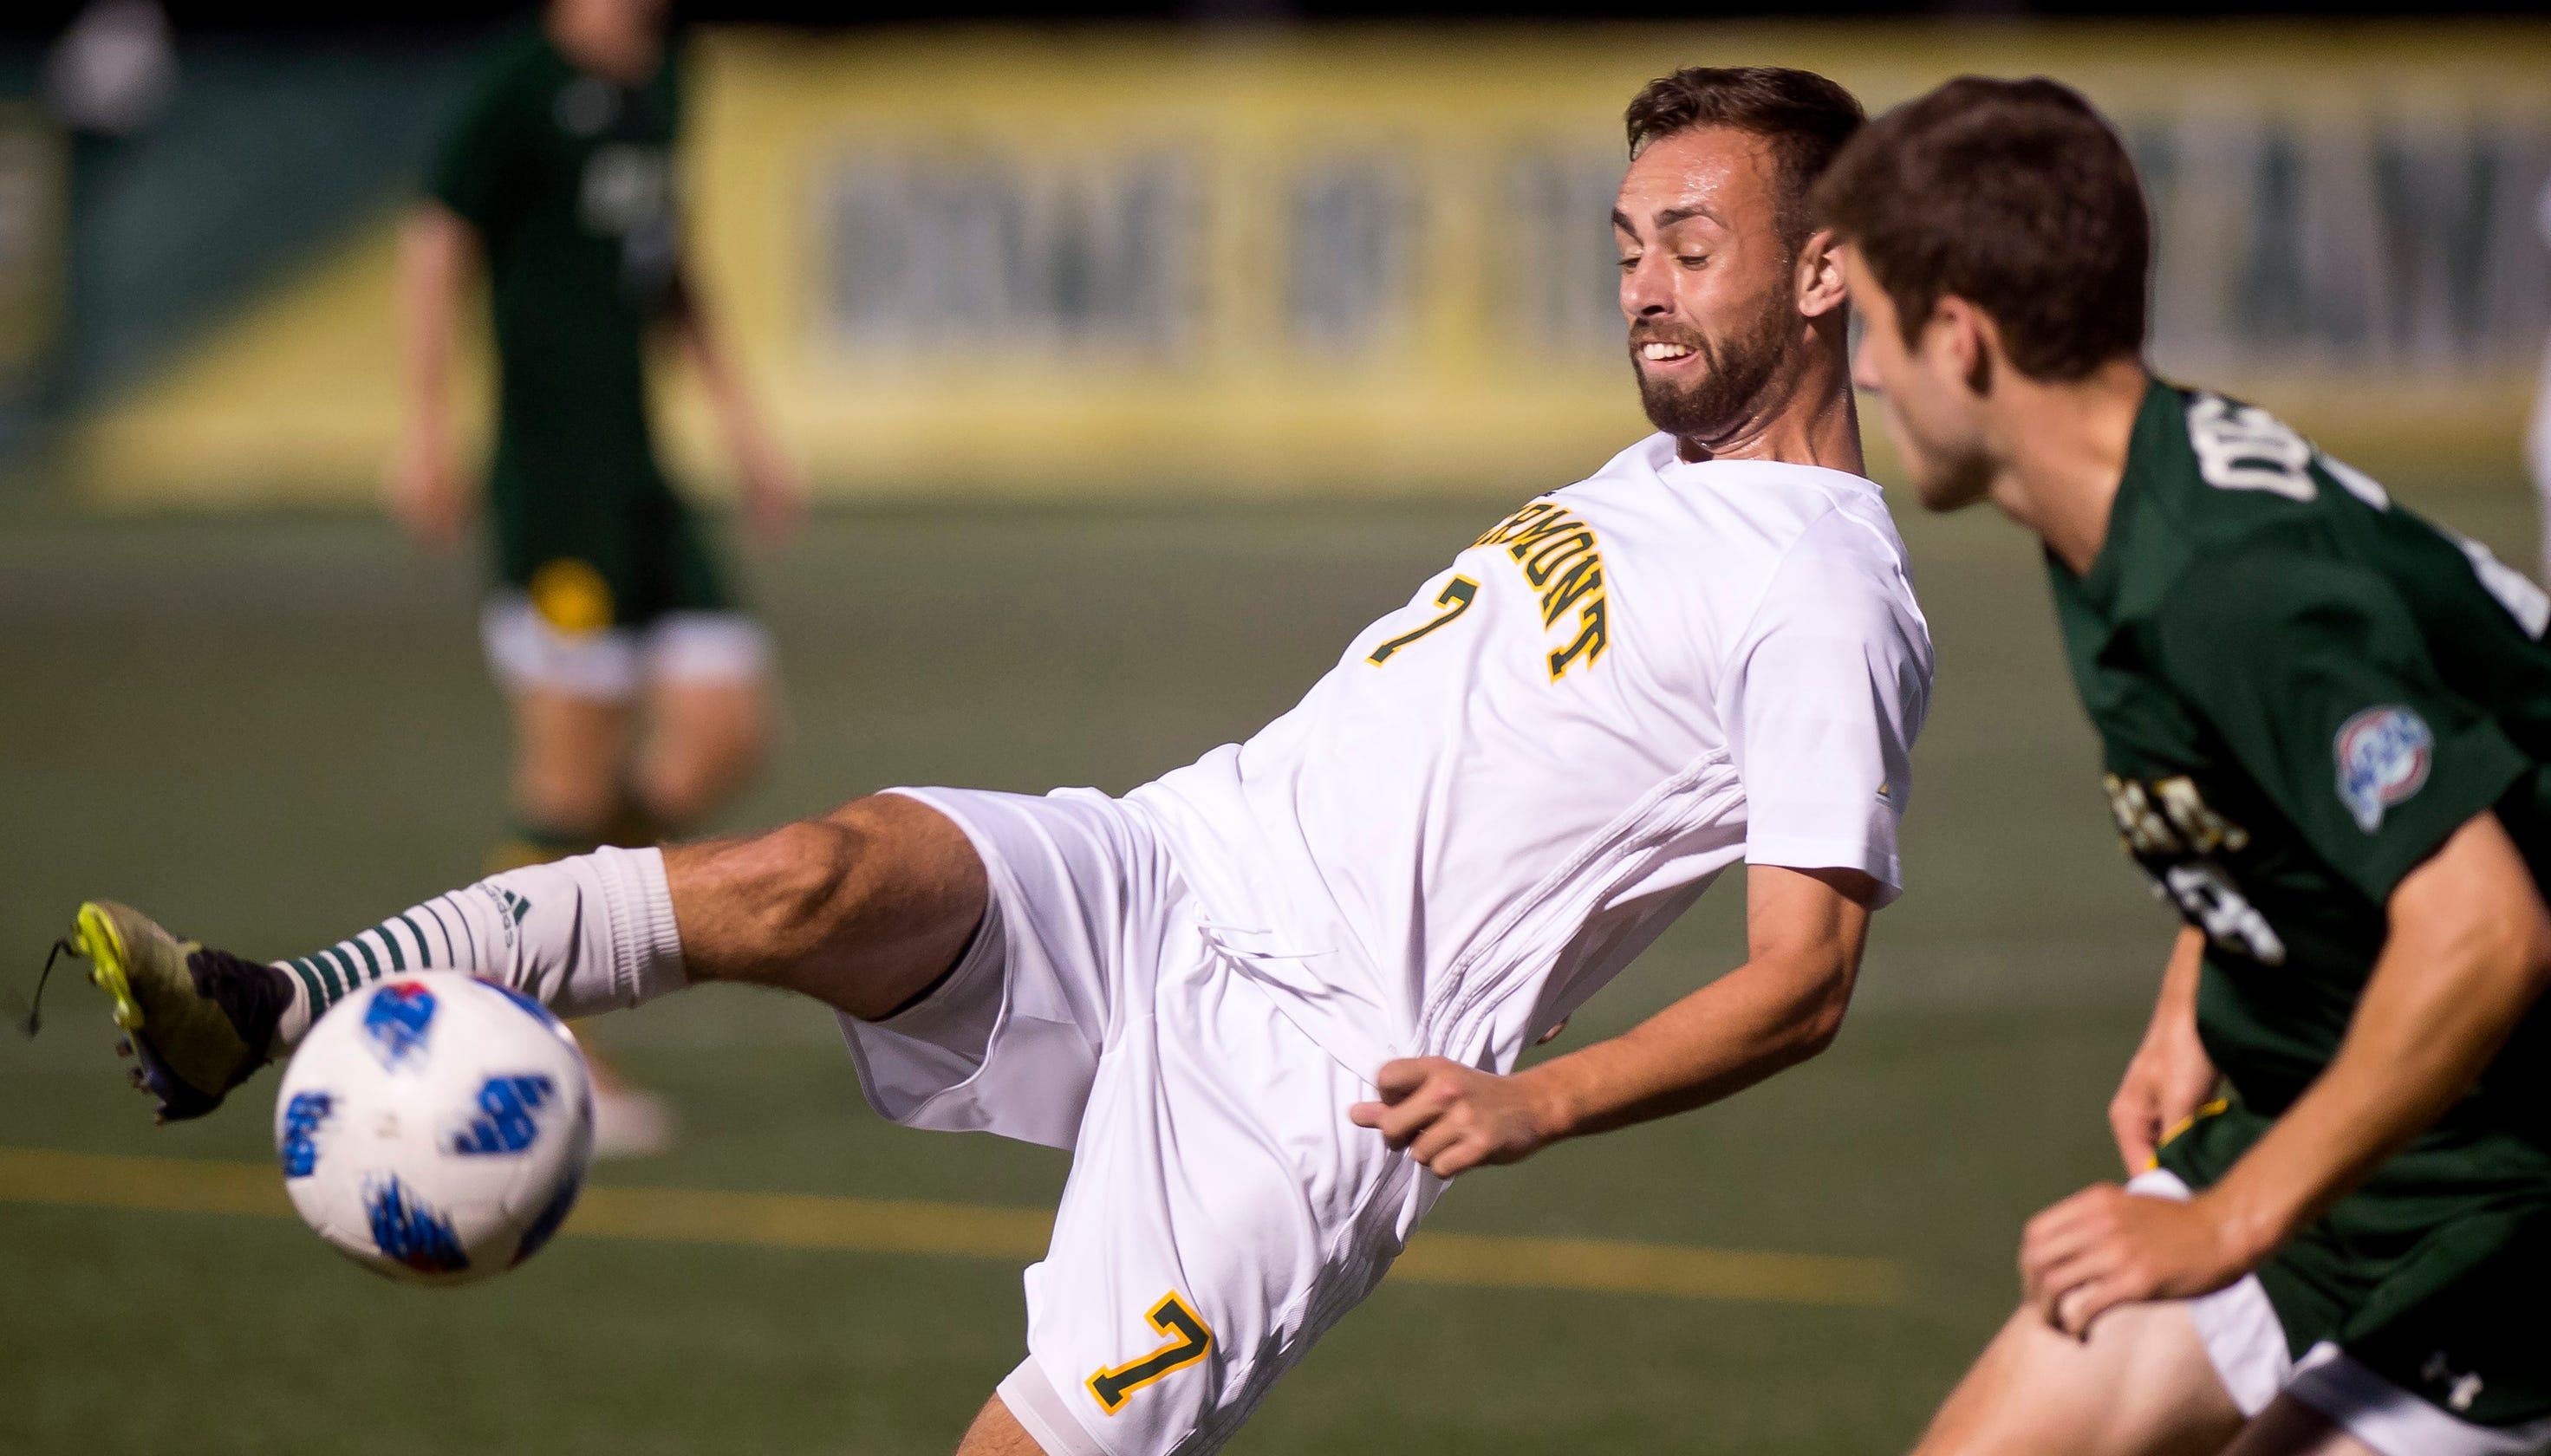 UVM men's soccer bounces back with 3-0 win over UMBC